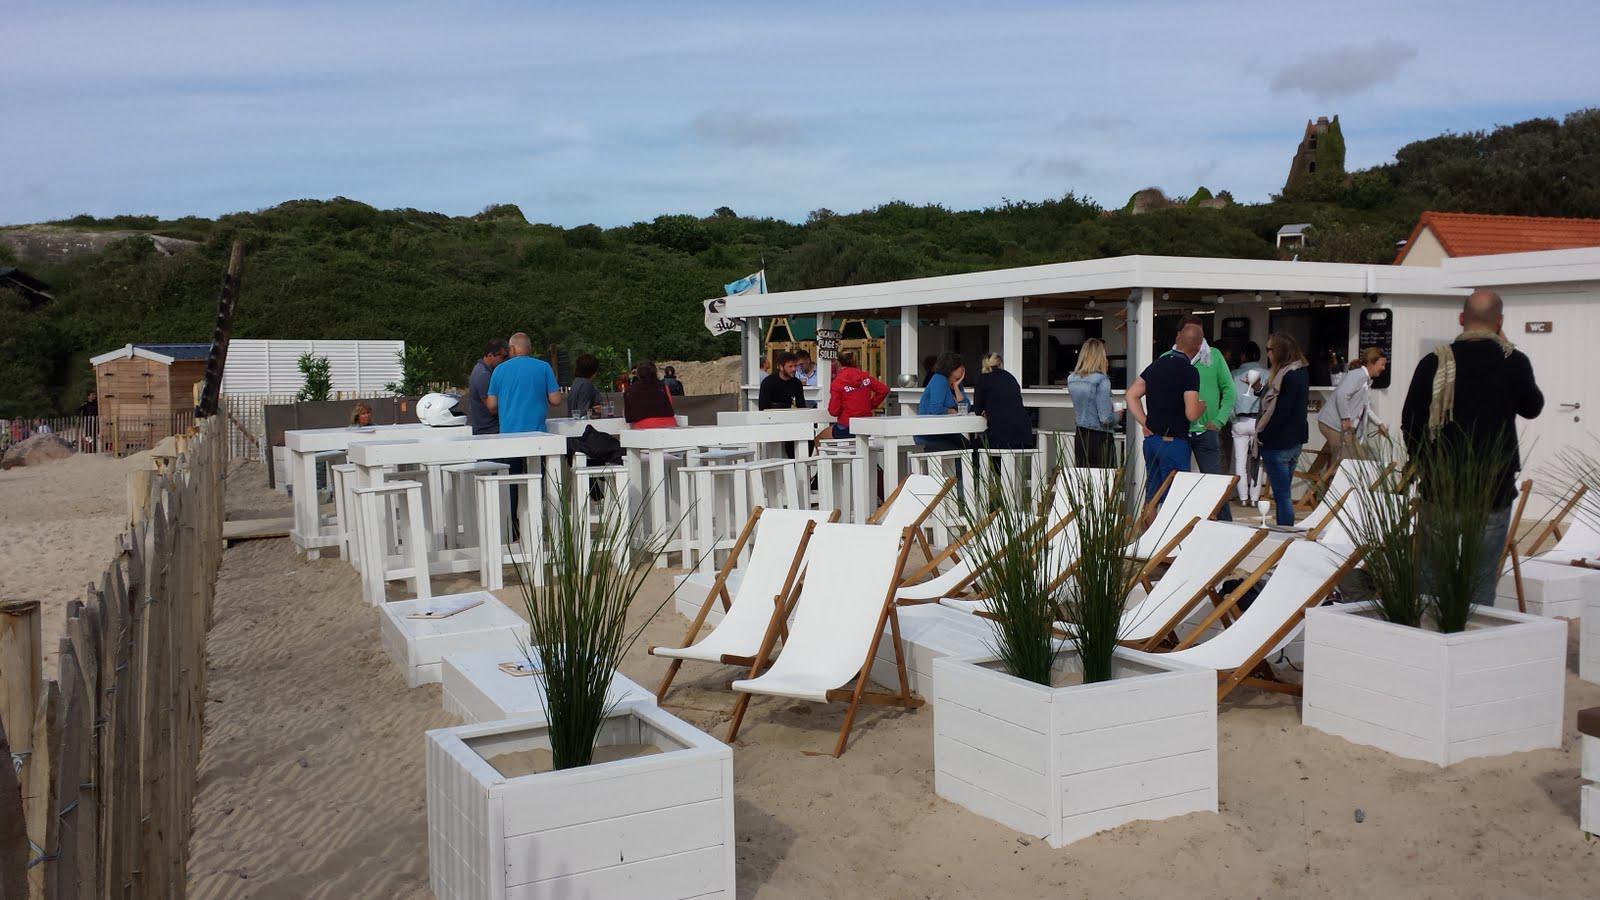 Village Mag La plage wissant 02